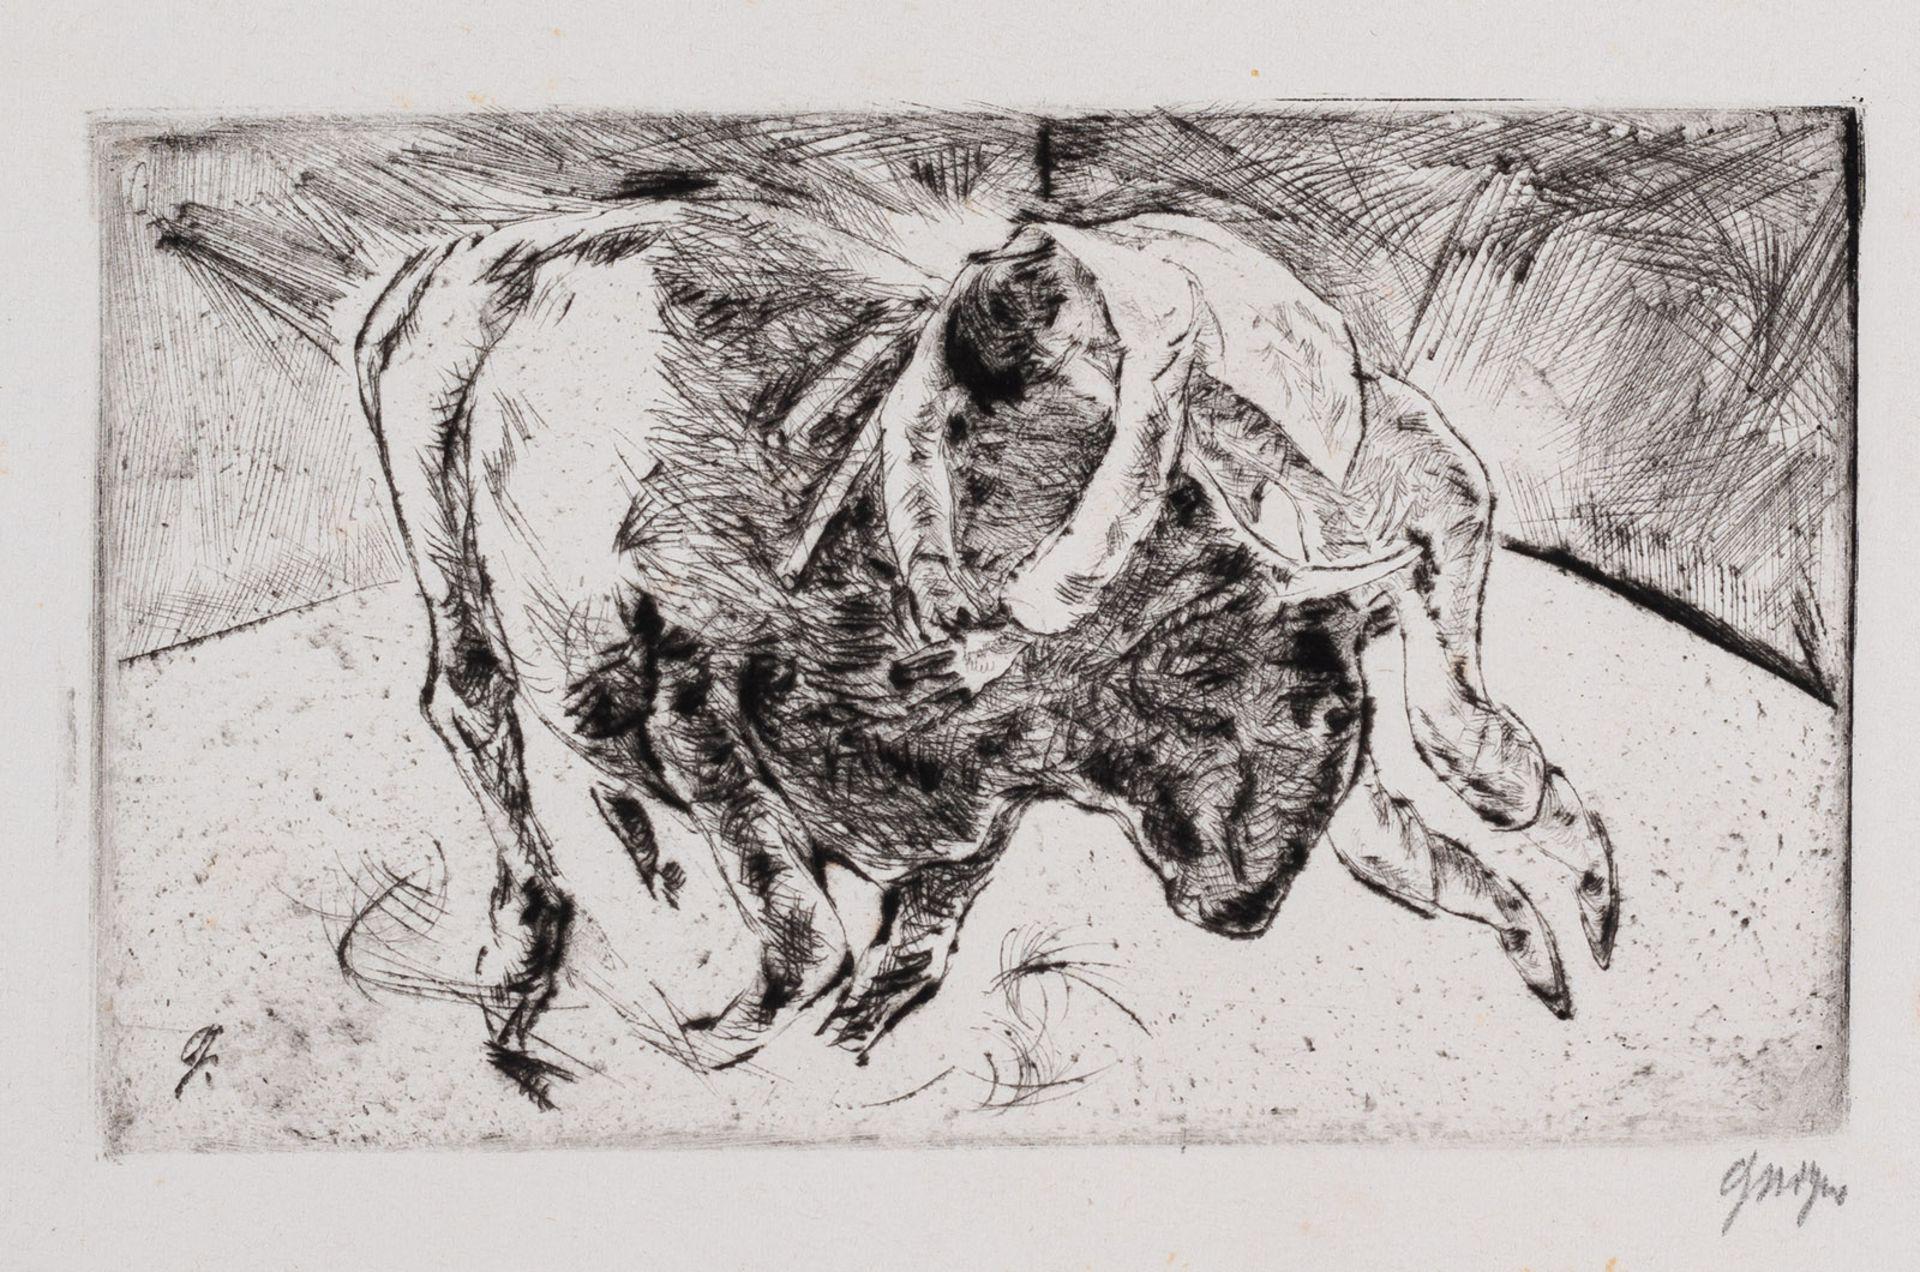 Geiger, Willi - Image 11 of 22